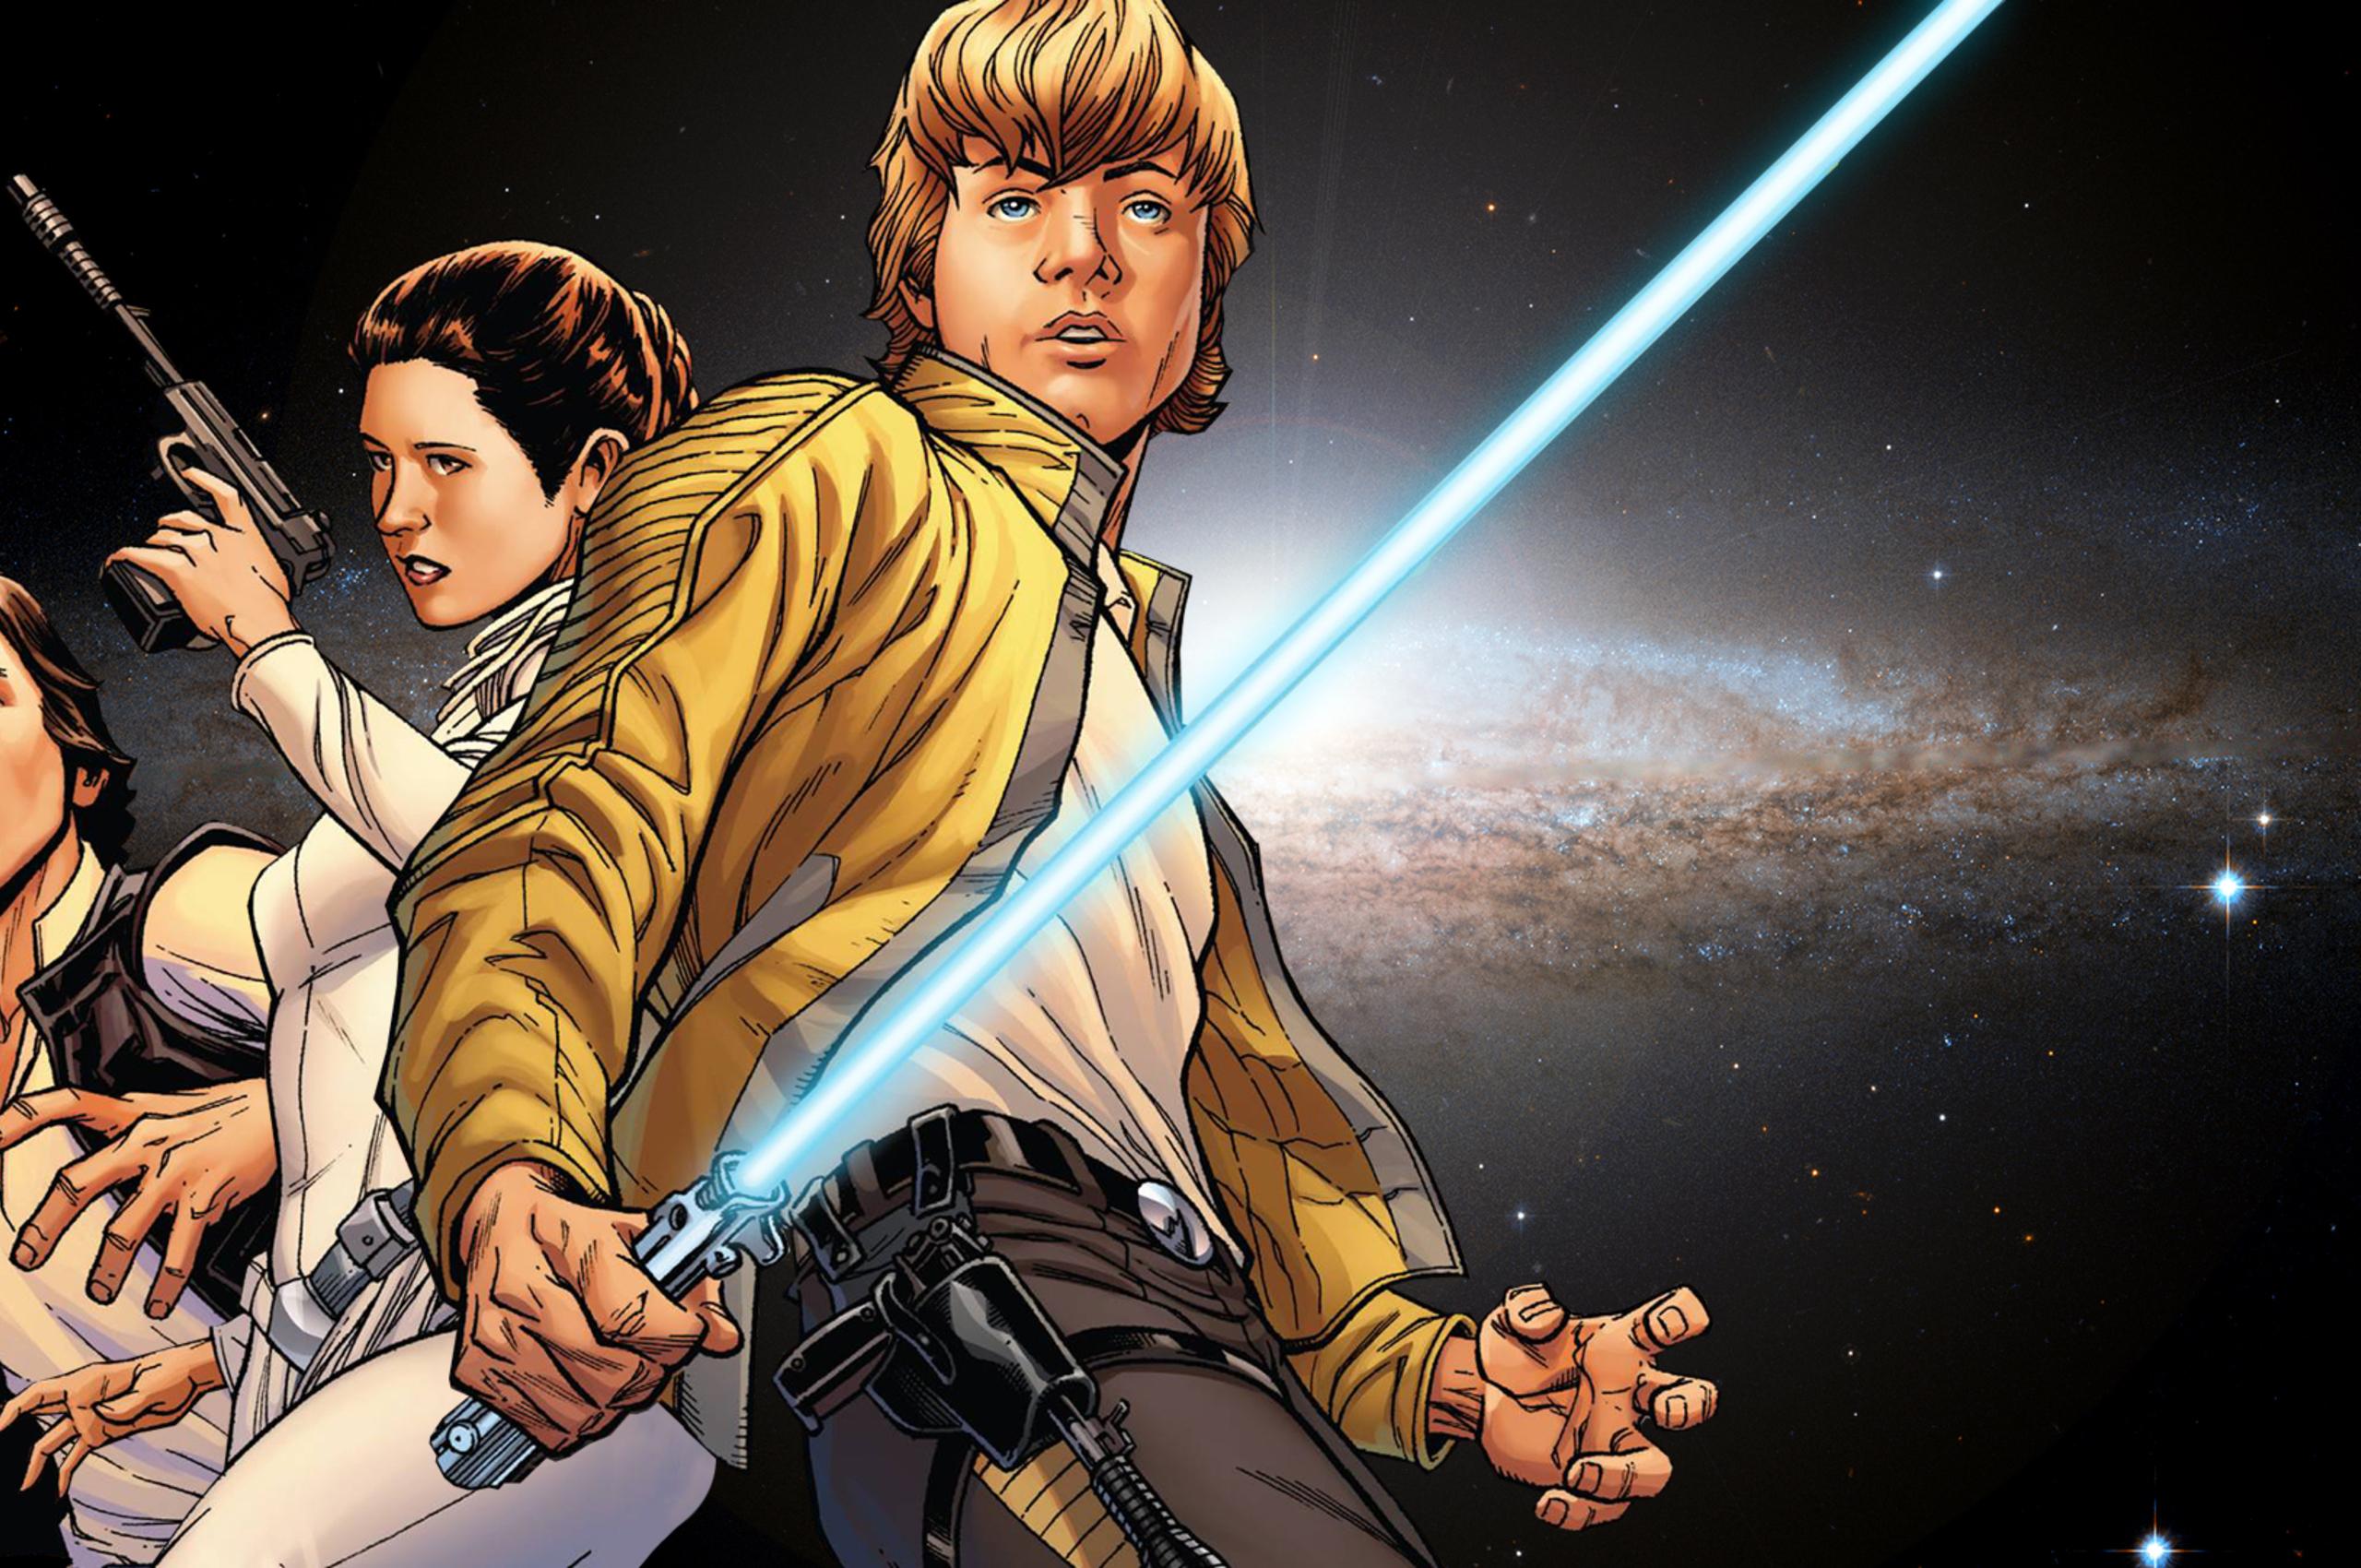 Luke Skywalker Han Solo Princess Leia Artwork X9